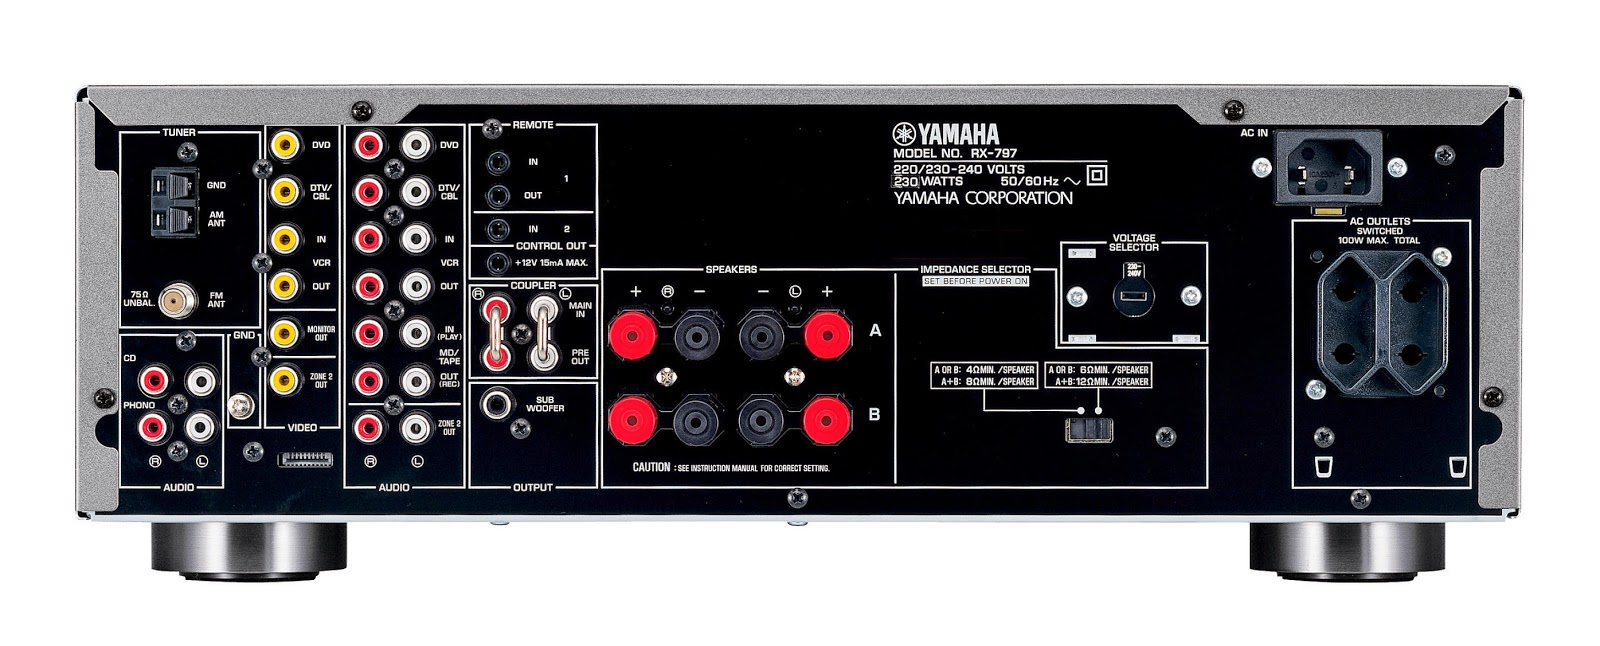 medium resolution of yamaha rx v340 service manual download free wrg 7488 whole home audio wiring diagram yamaha rx a1050 rx v359 yamaha av receivers service manual ampli